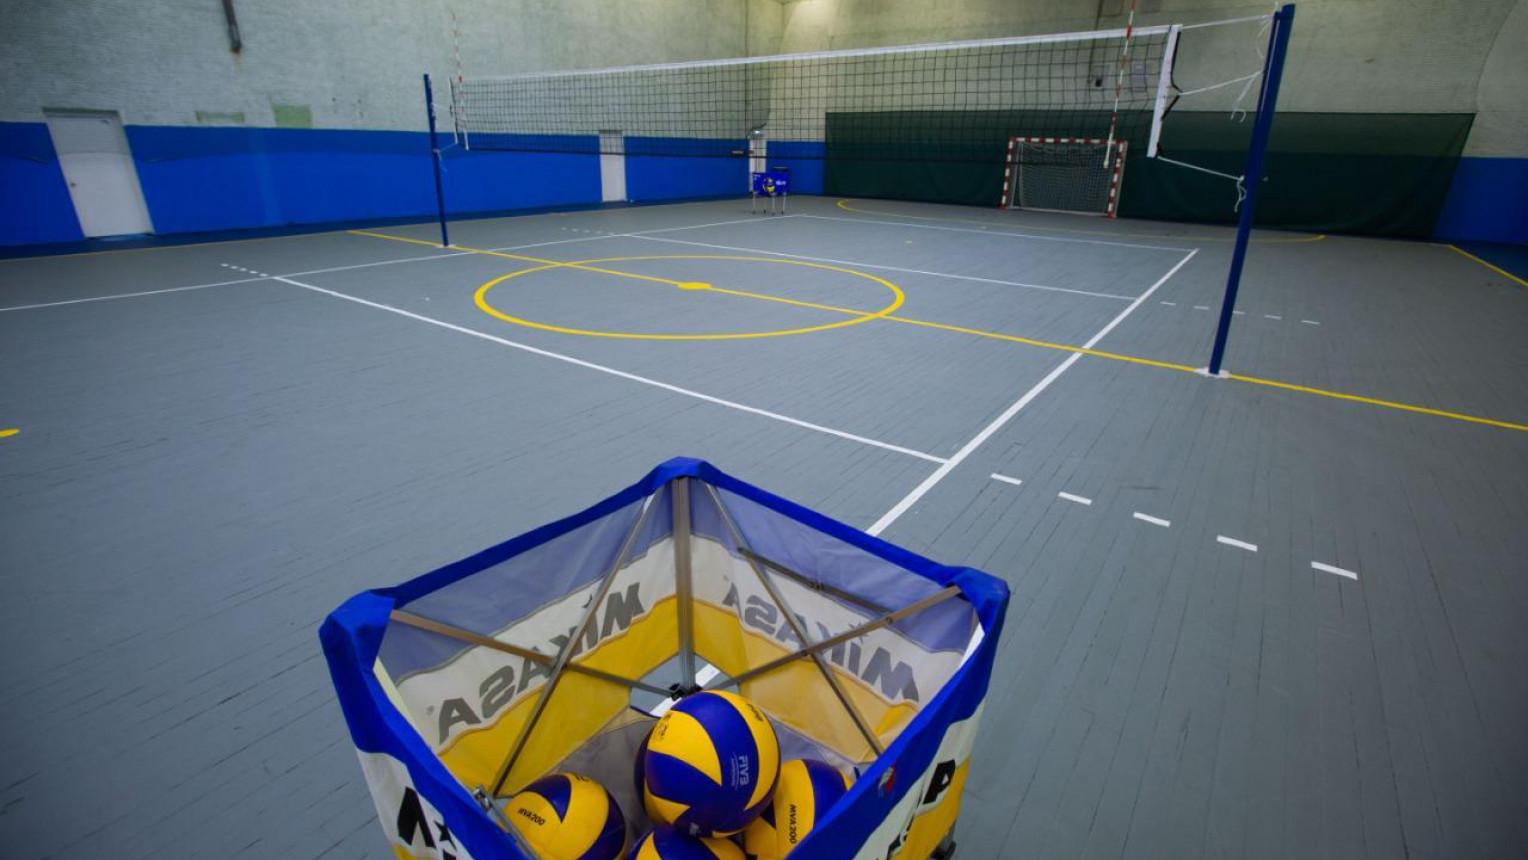 Зал для футбола и волейбола - фото №1